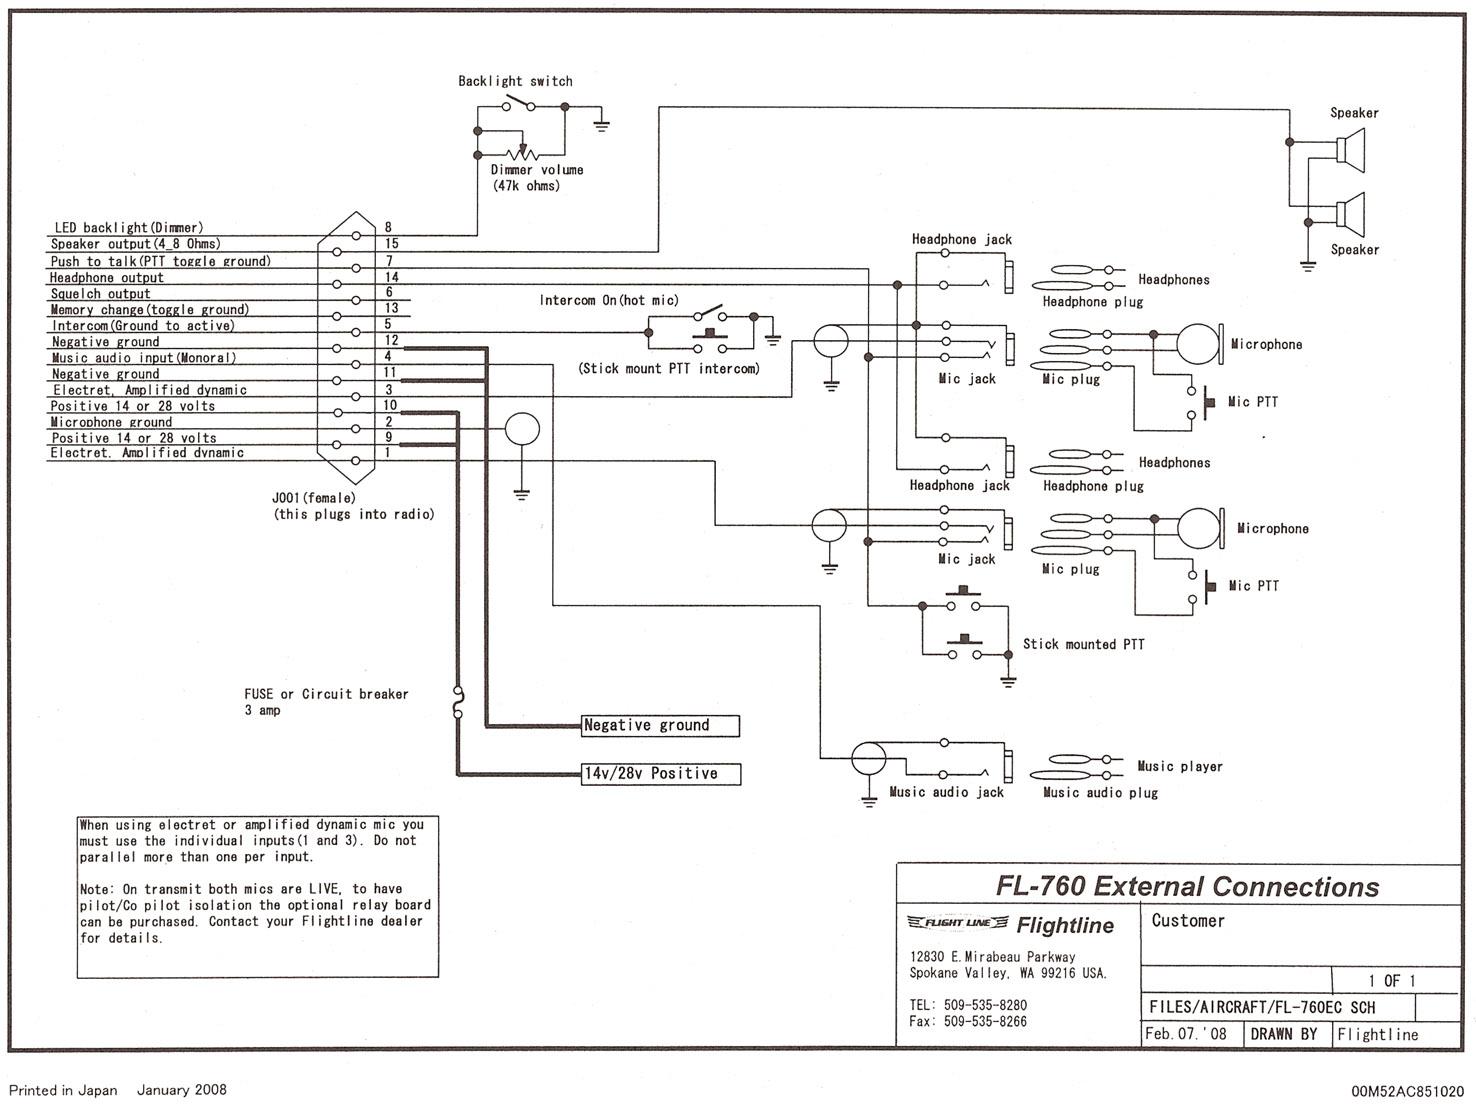 Skytronics alternator wiring diagram gm 2 wire alternator wiring skytronics alternator wiring diagram jasco alternator wiring rh color castles com cessna 170b wiring diagram cheapraybanclubmaster Gallery